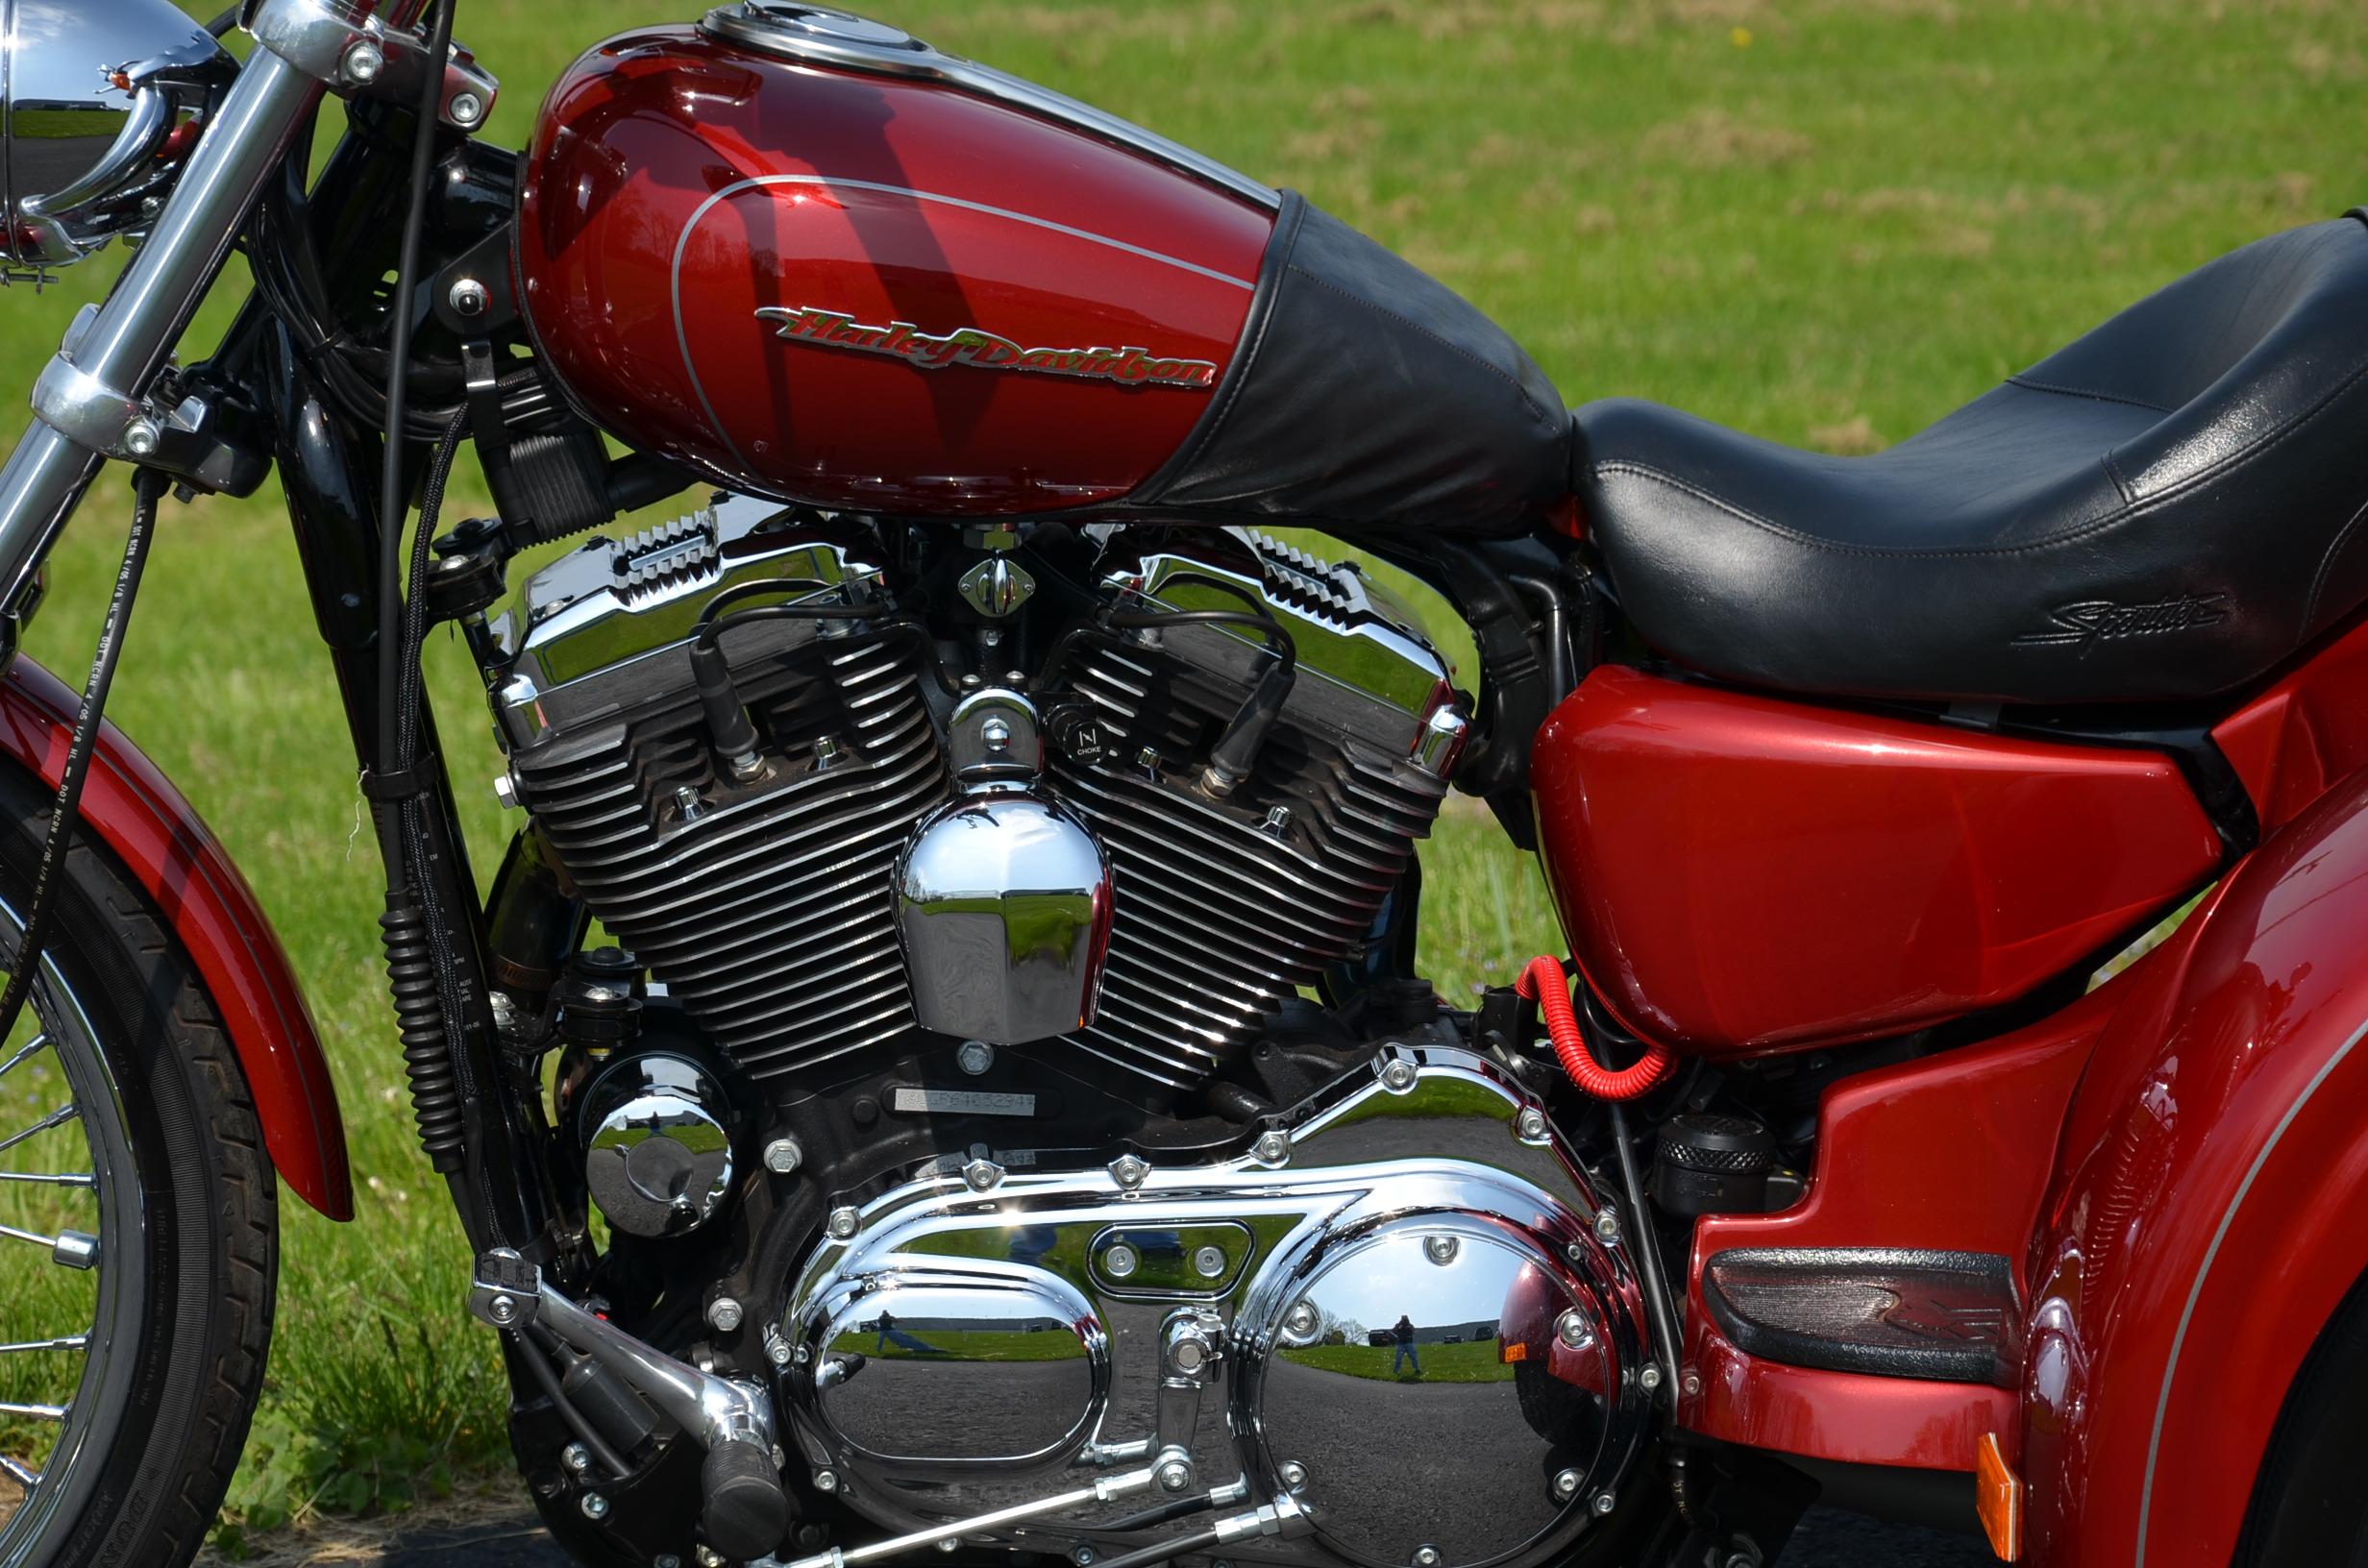 2006 Harley Davidson Sportster Ebay